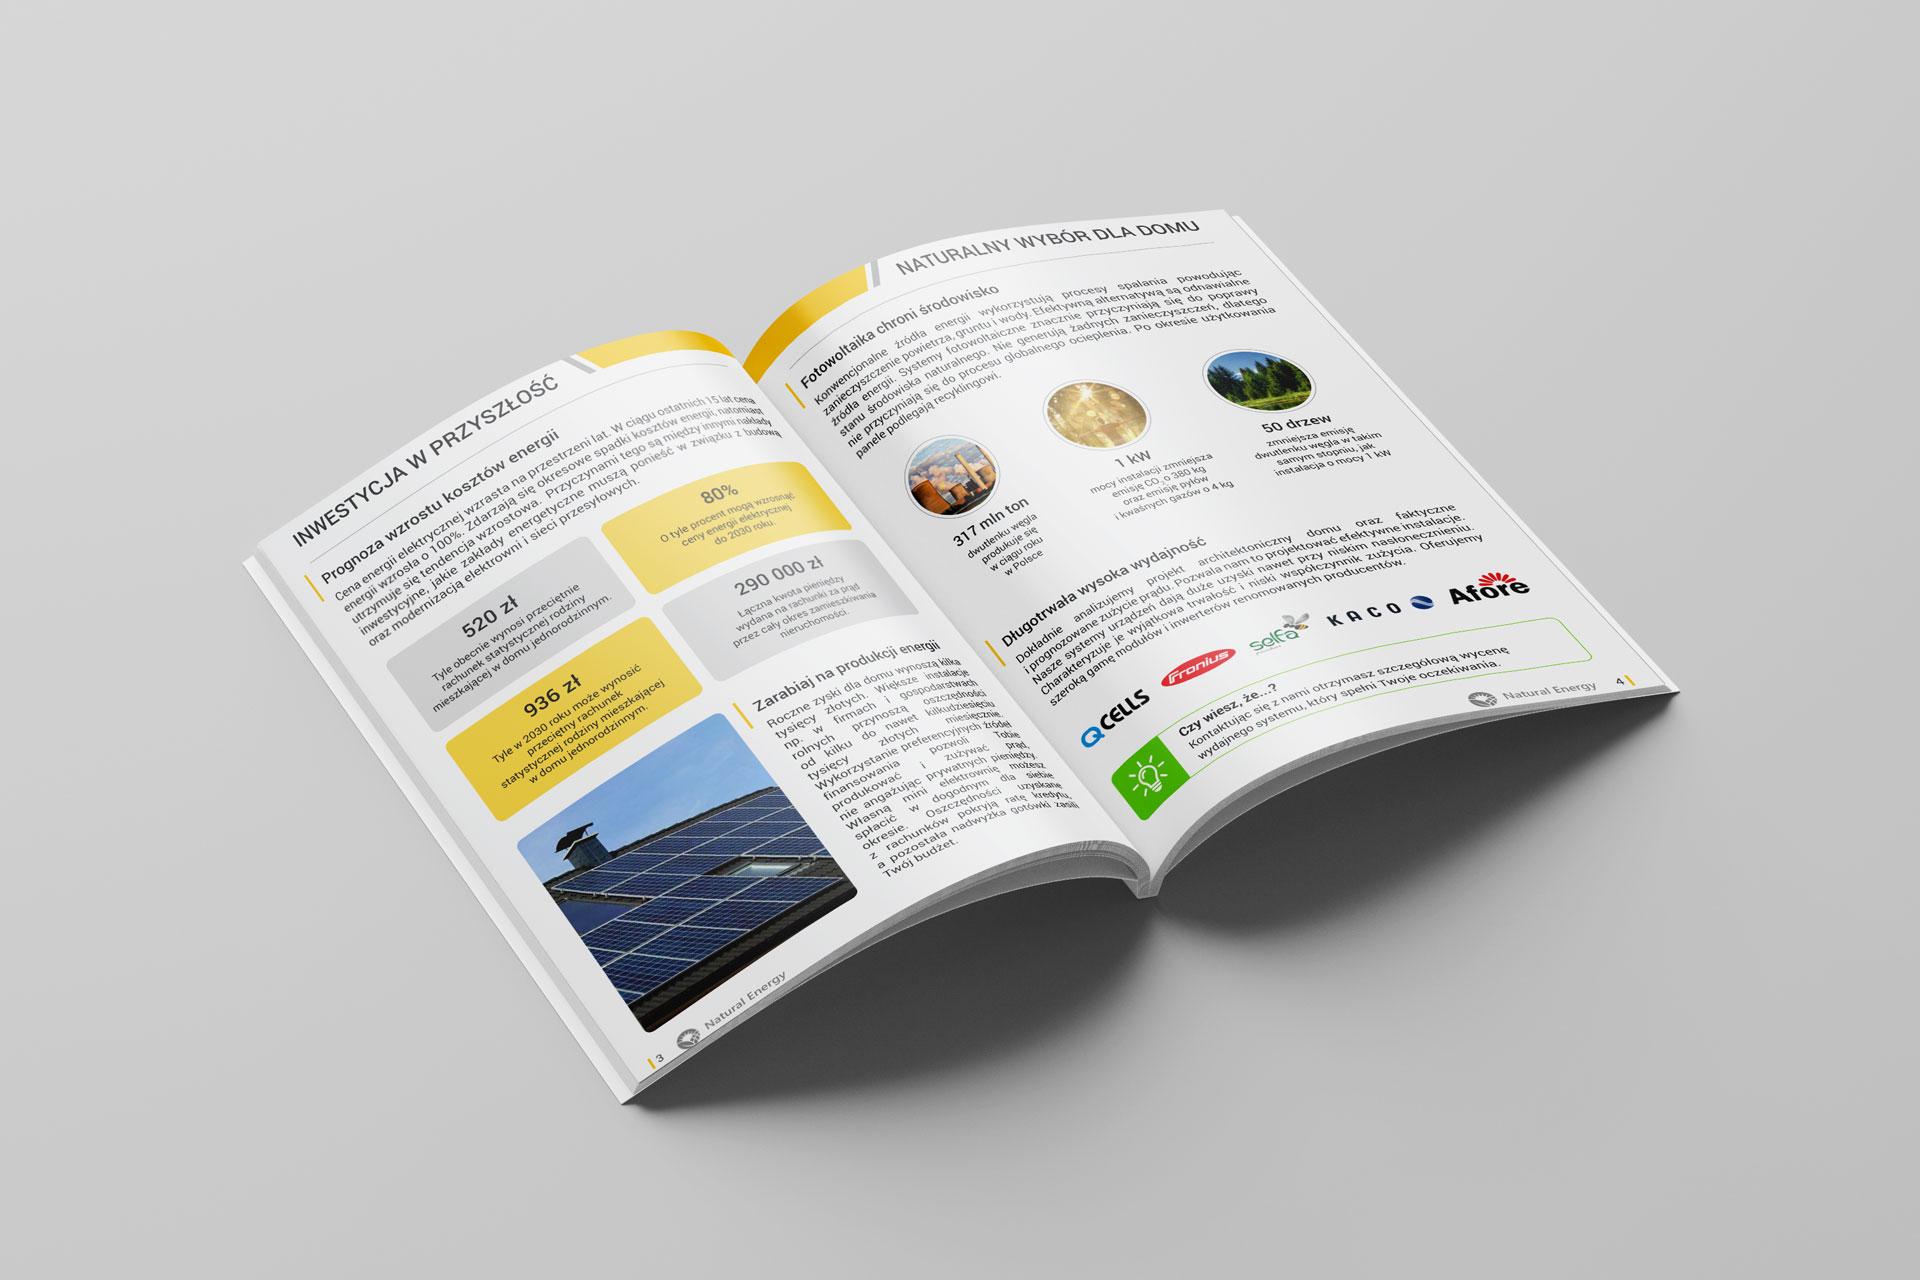 Projektowanie-graficzne-Natural-Energy-Katalogi-reklamowe-7